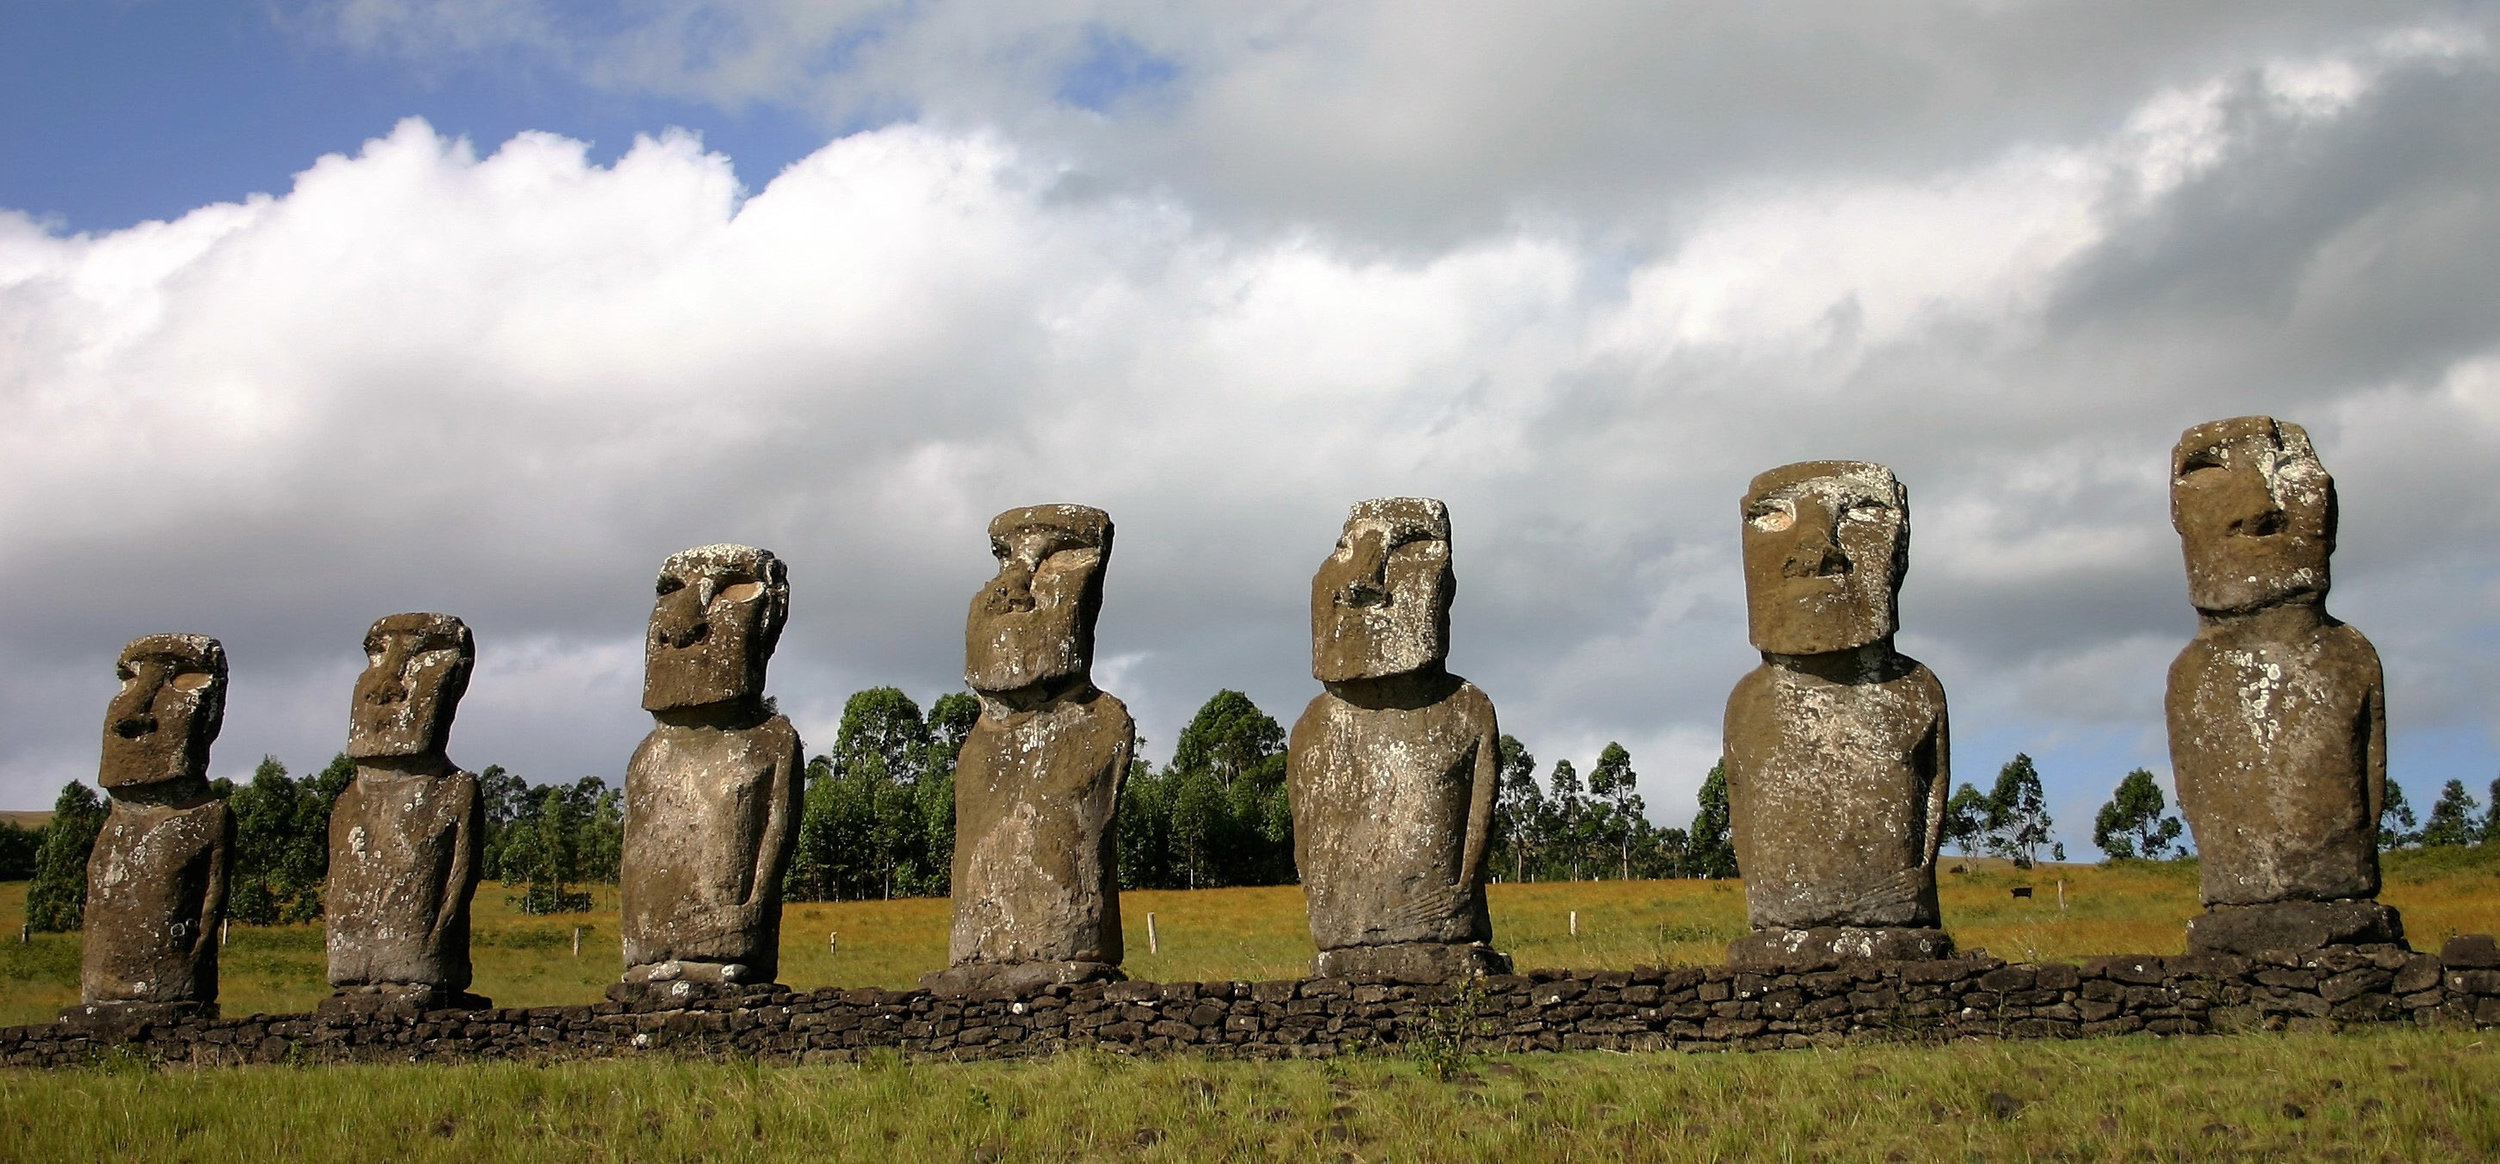 moai-statues-easter-island-chile.jpg